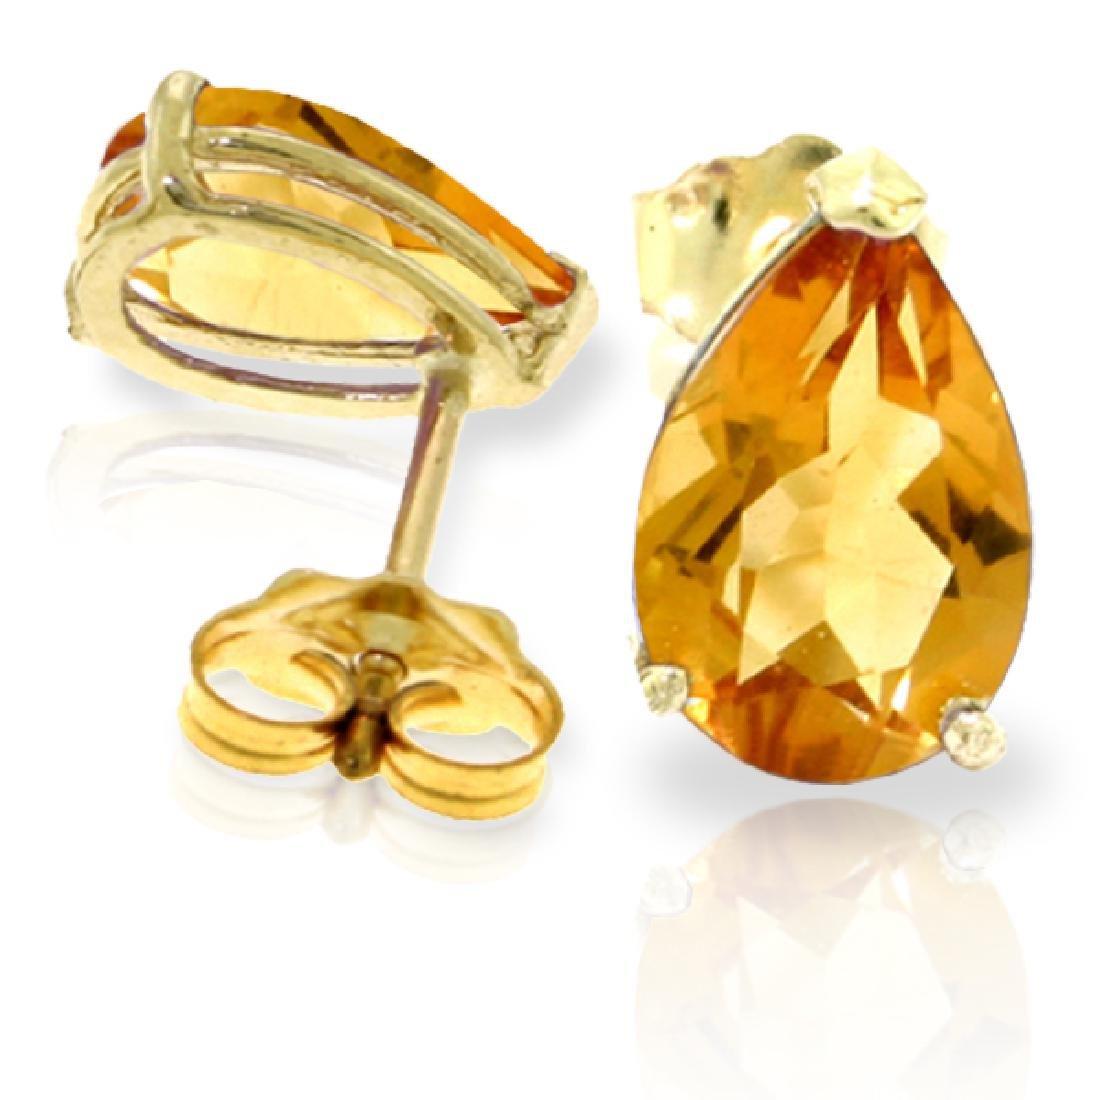 Genuine 3.15 ctw Citrine Earrings Jewelry 14KT Yellow